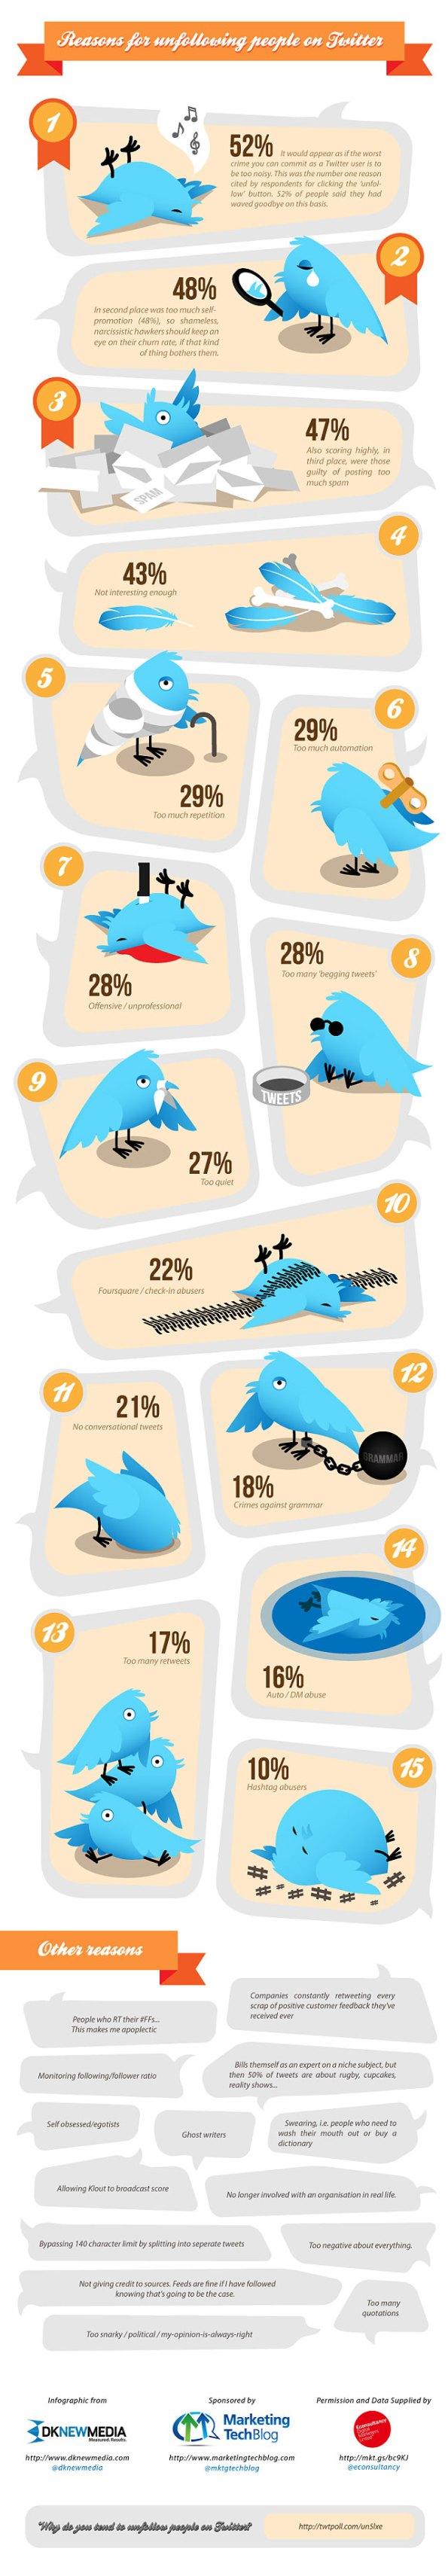 15 motivos para no seguirte en Twitter